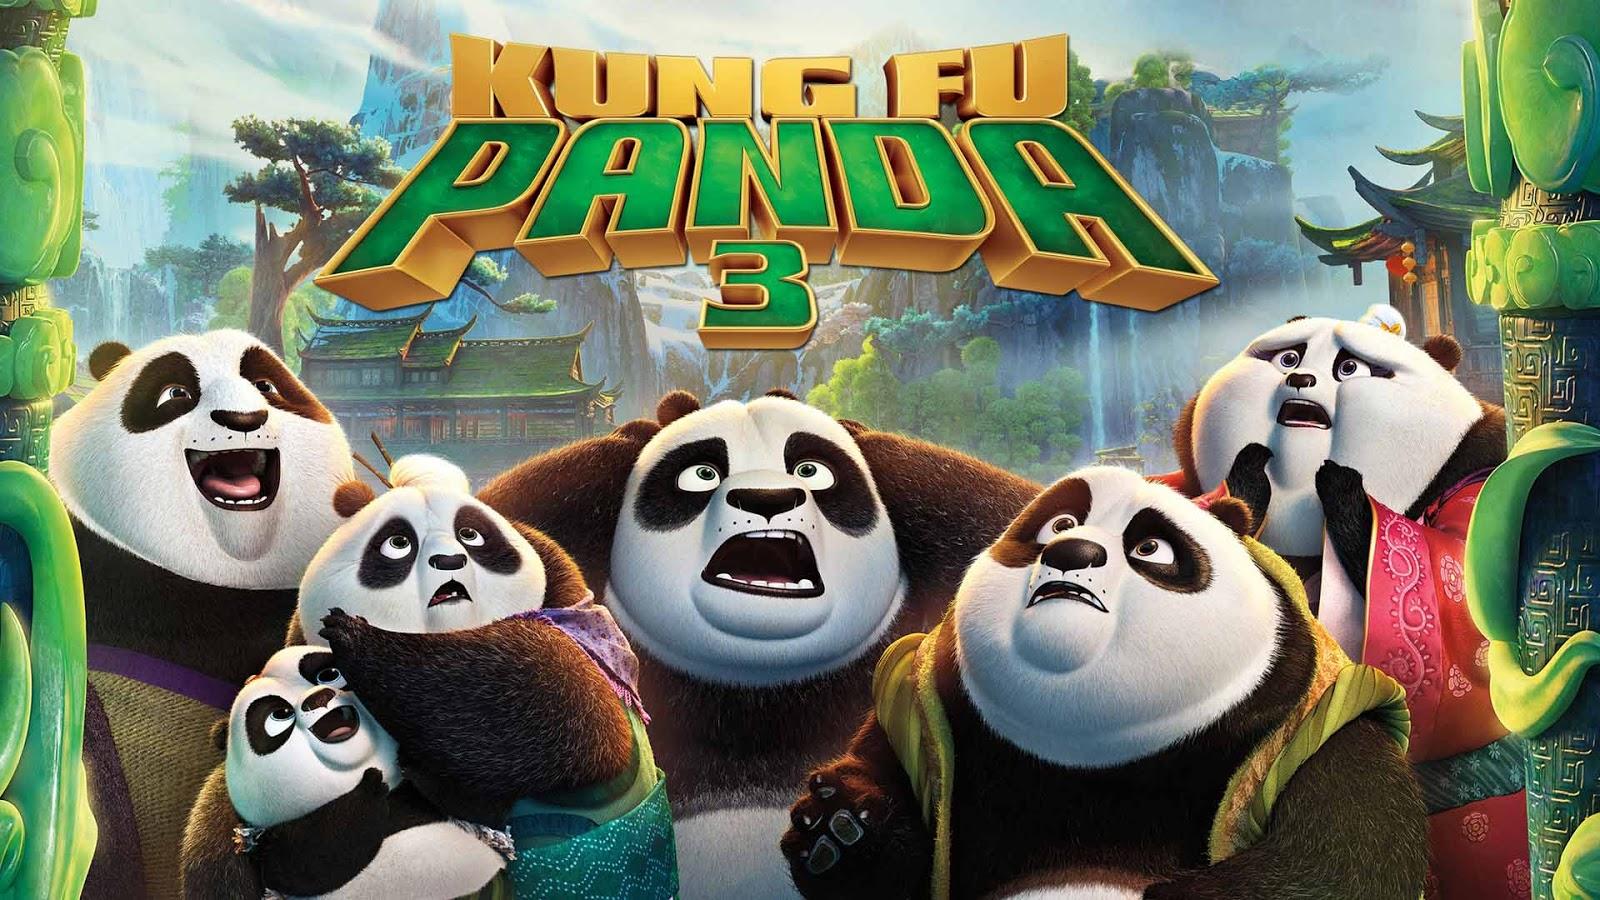 kung fu panda 3 2016 hdrip | ar1nine mhd